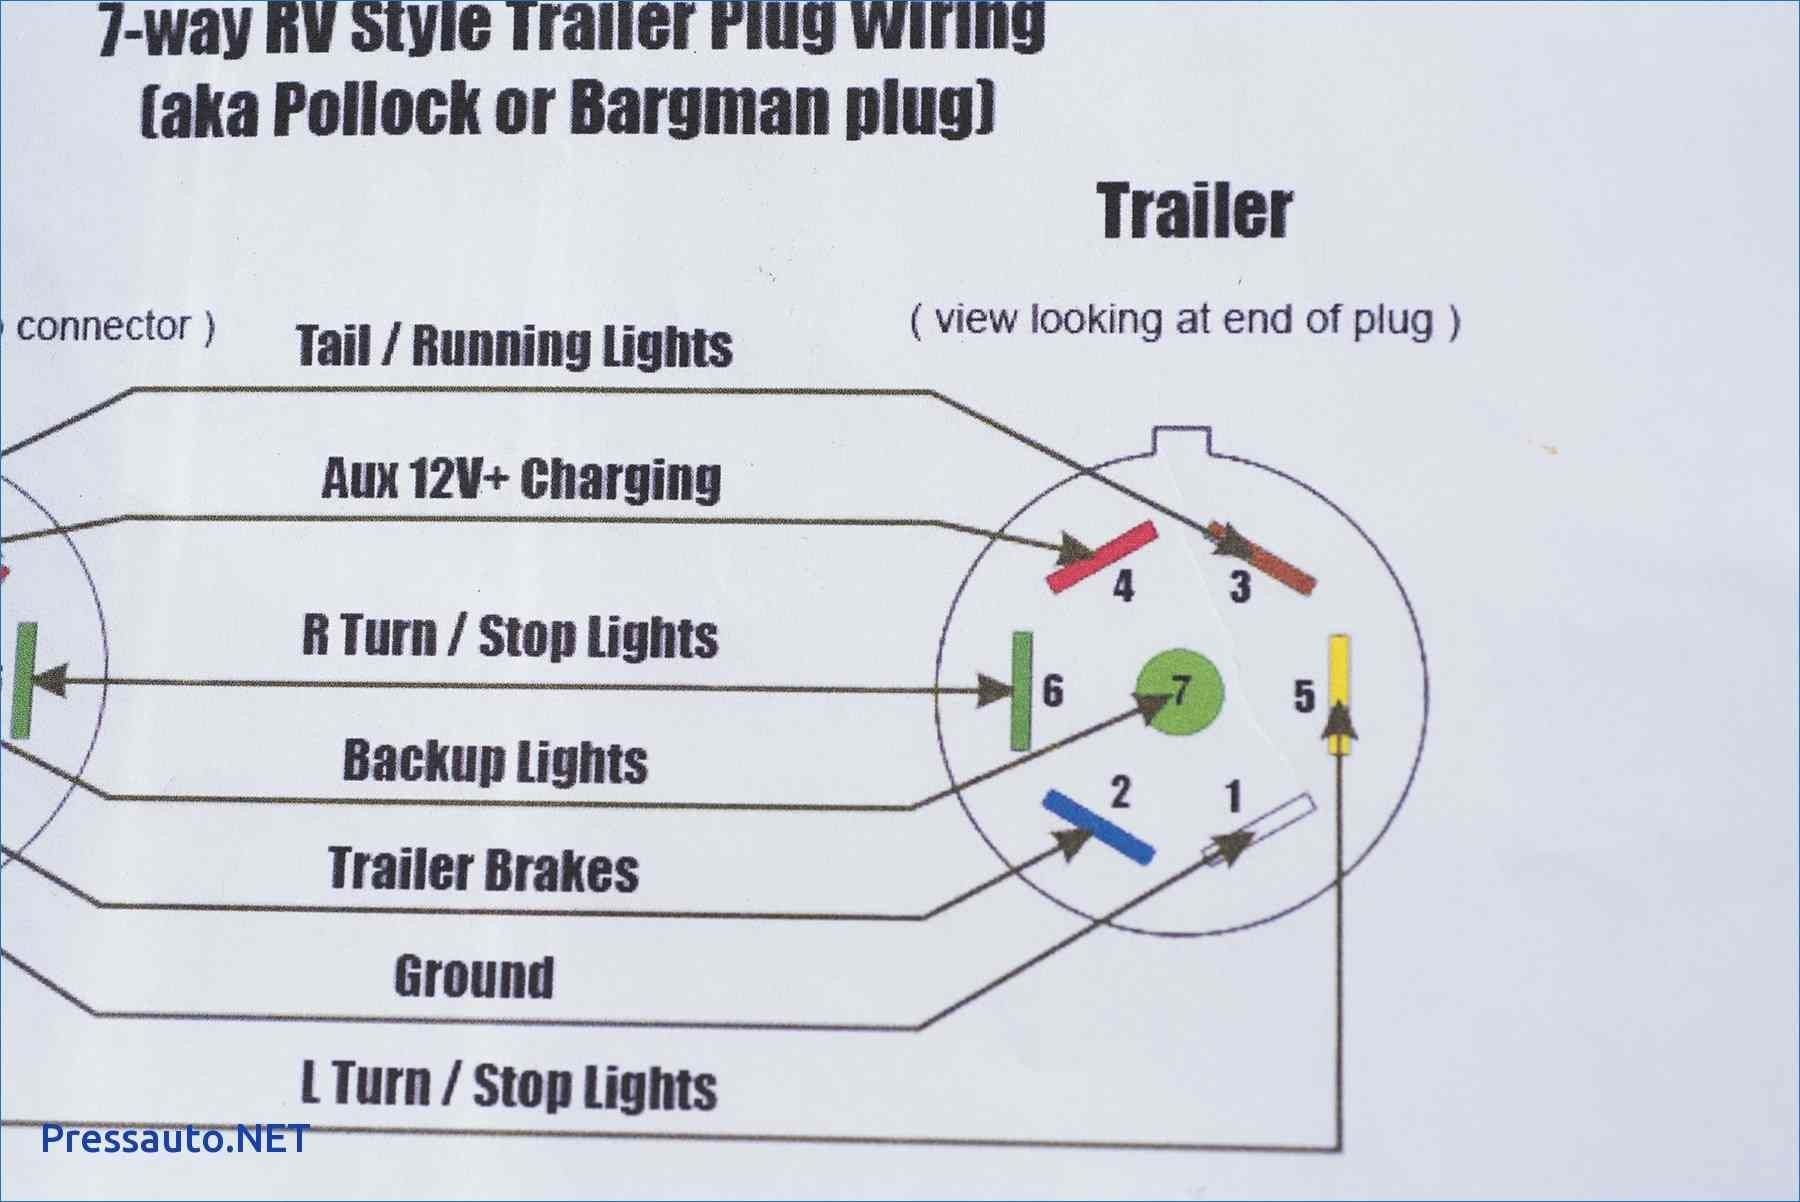 Trailer Wiring Diagram 7 Way Wellread In 2020 Trailer Wiring Diagram Trailer Light Wiring Boat Trailer Lights